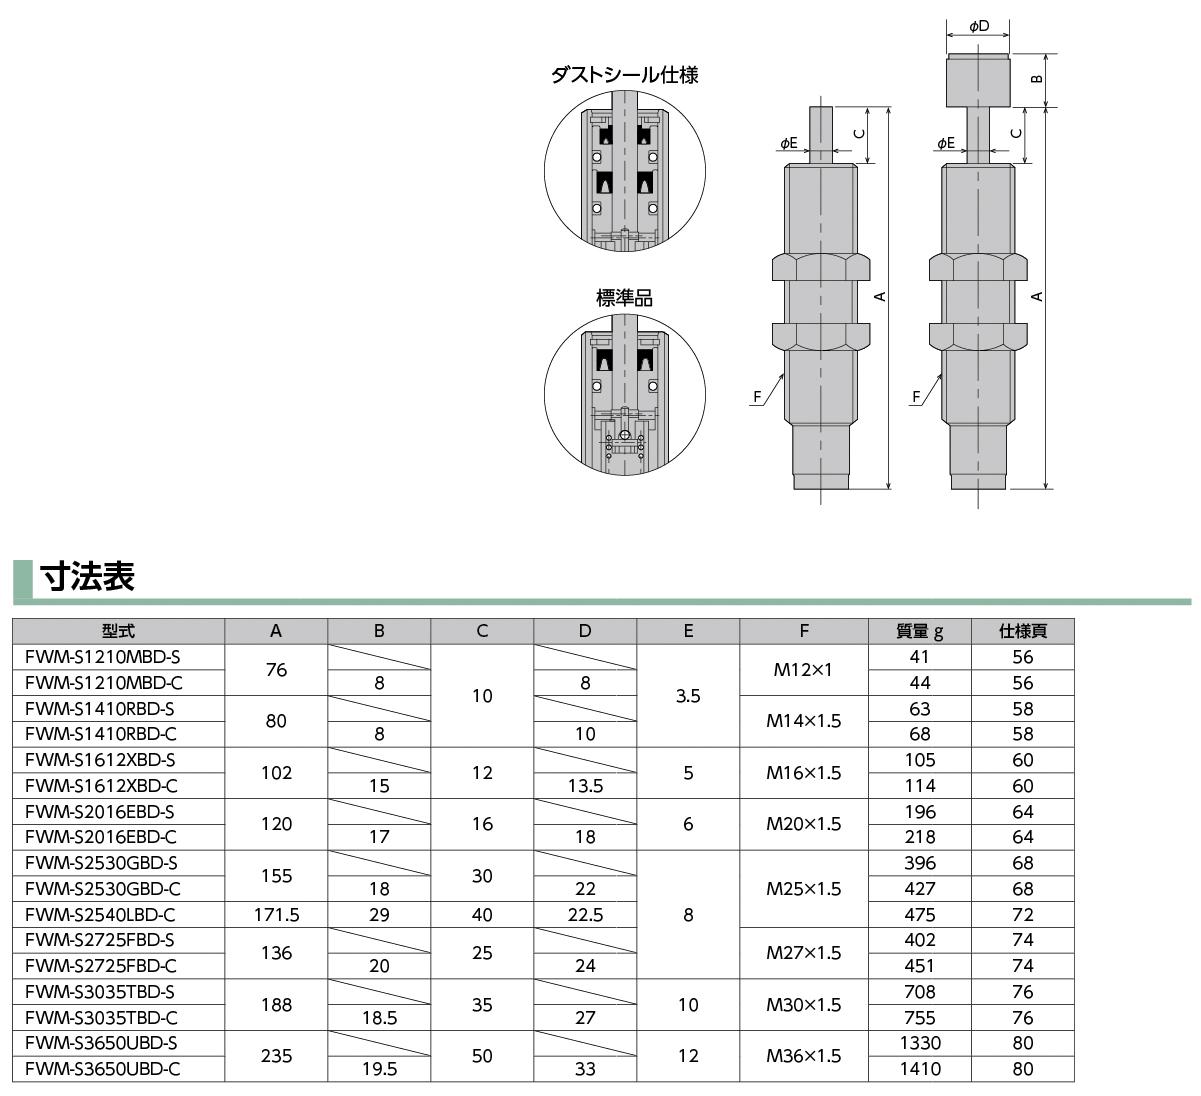 FWM-S1210MBD-*(ダストシール仕様)